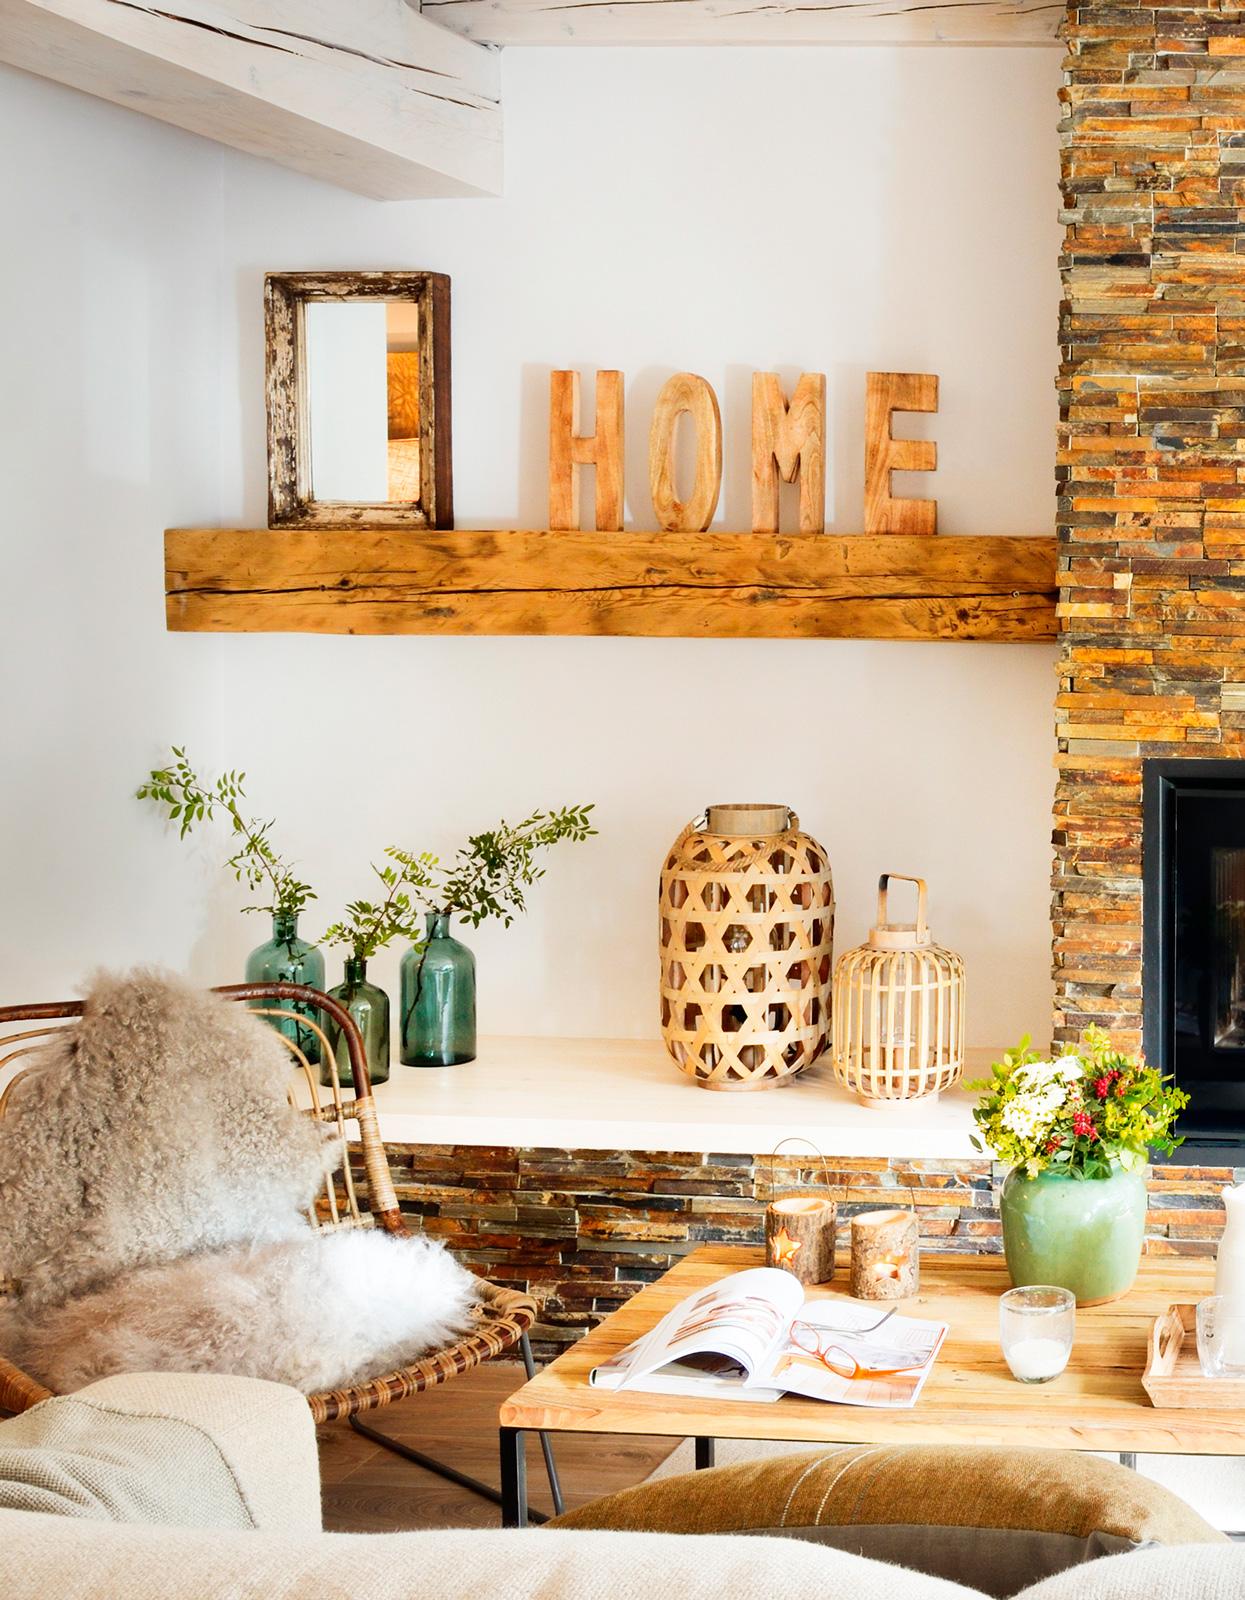 Letras de madera para decorar paredes no olvedeis visitar - Decorar paredes con letras ...